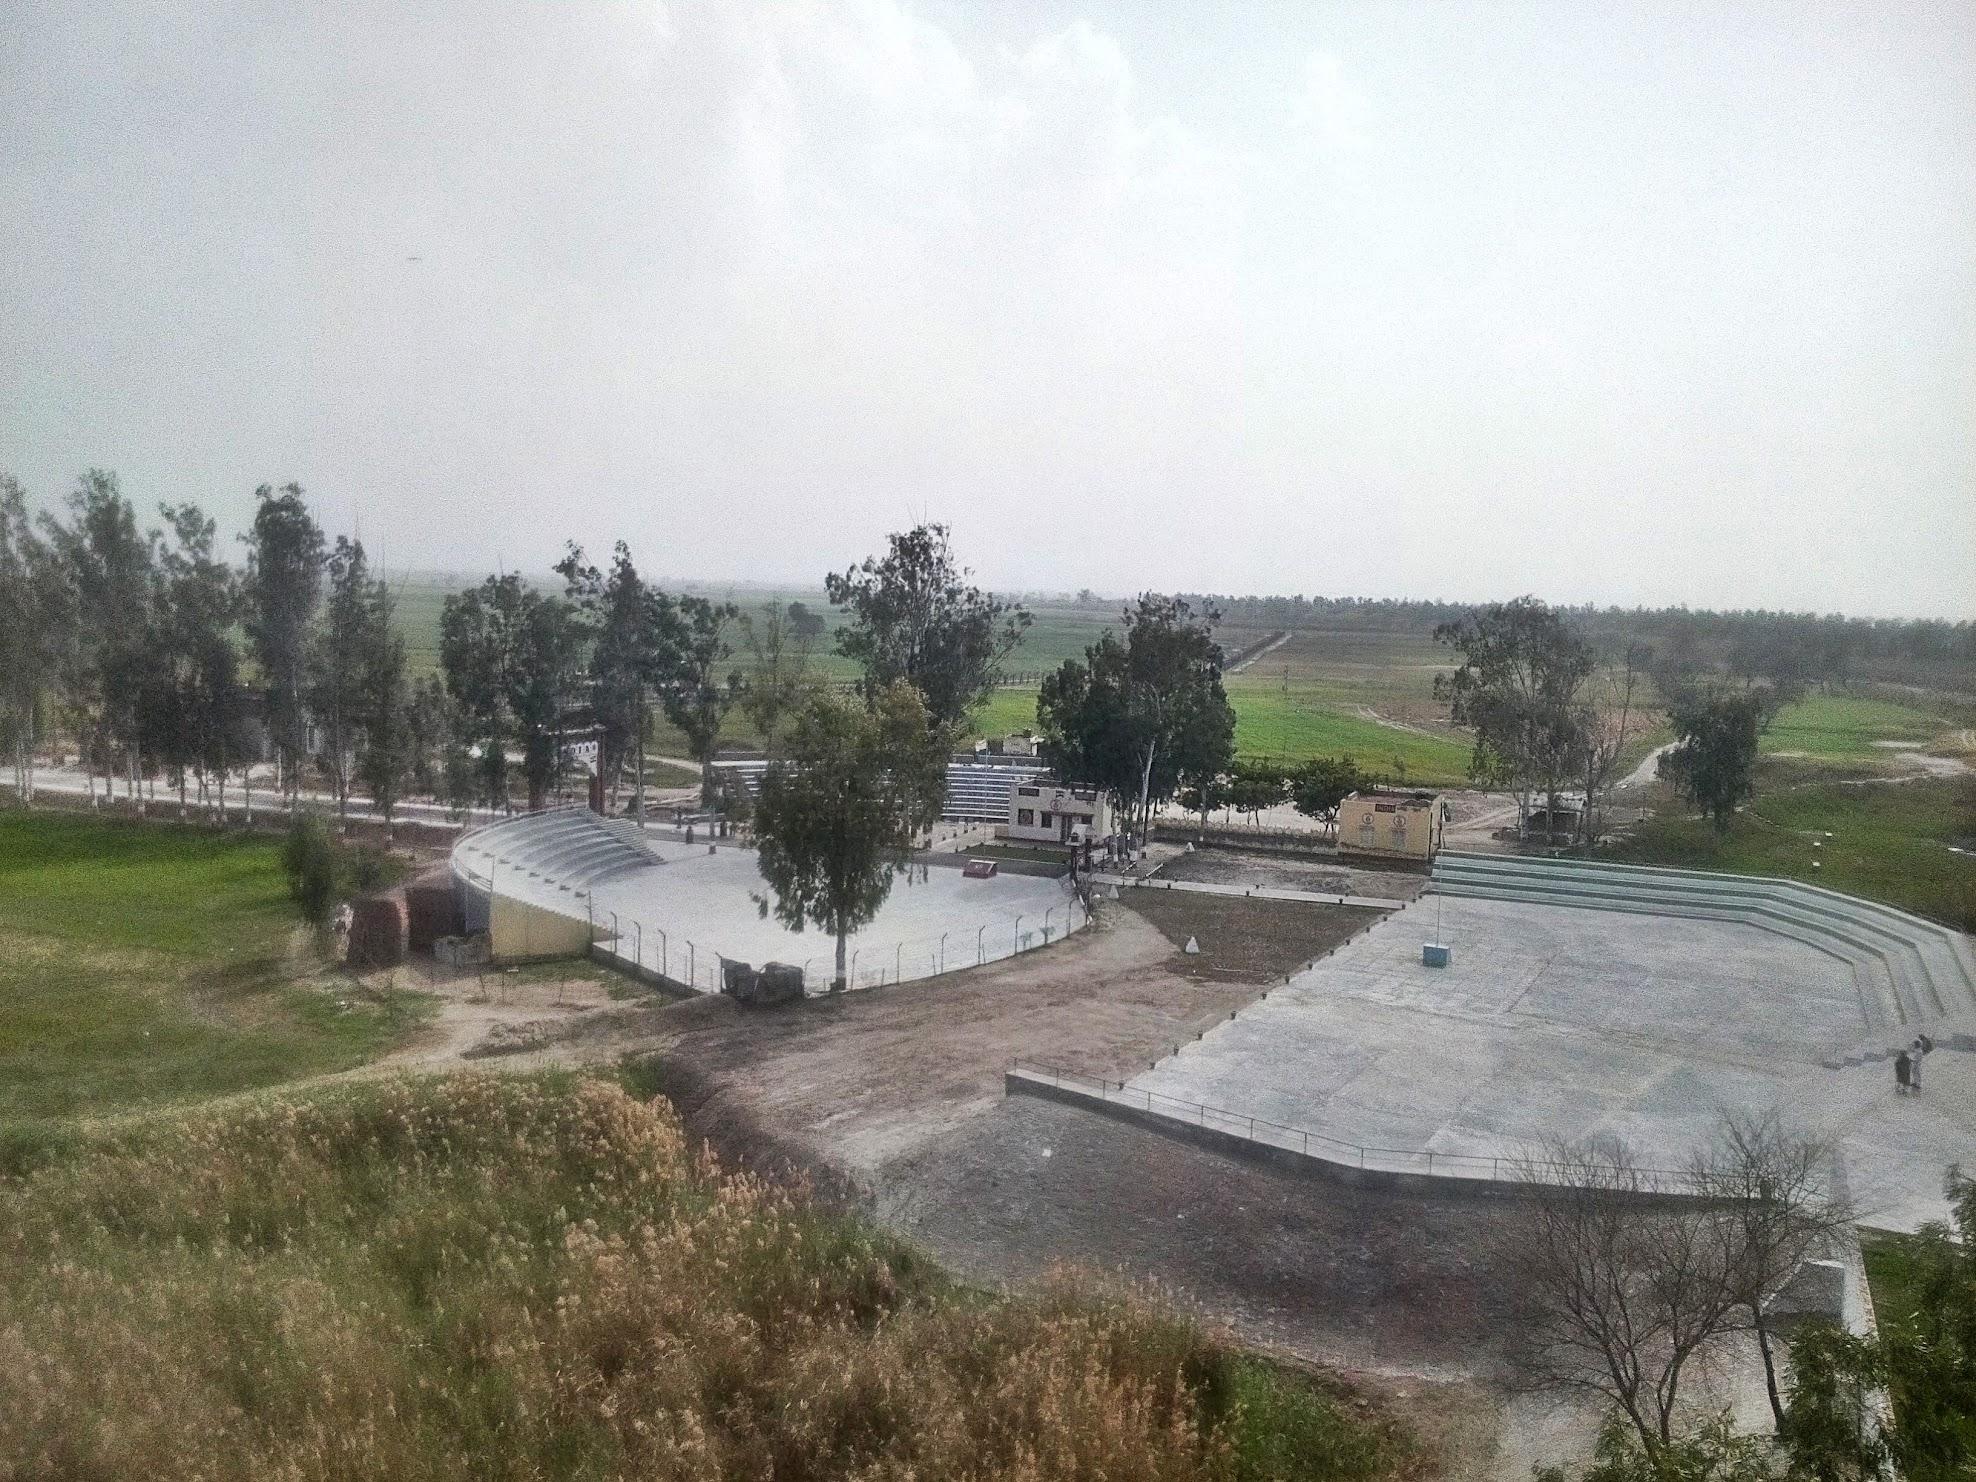 Parade Arena : Sulemanki Border Post